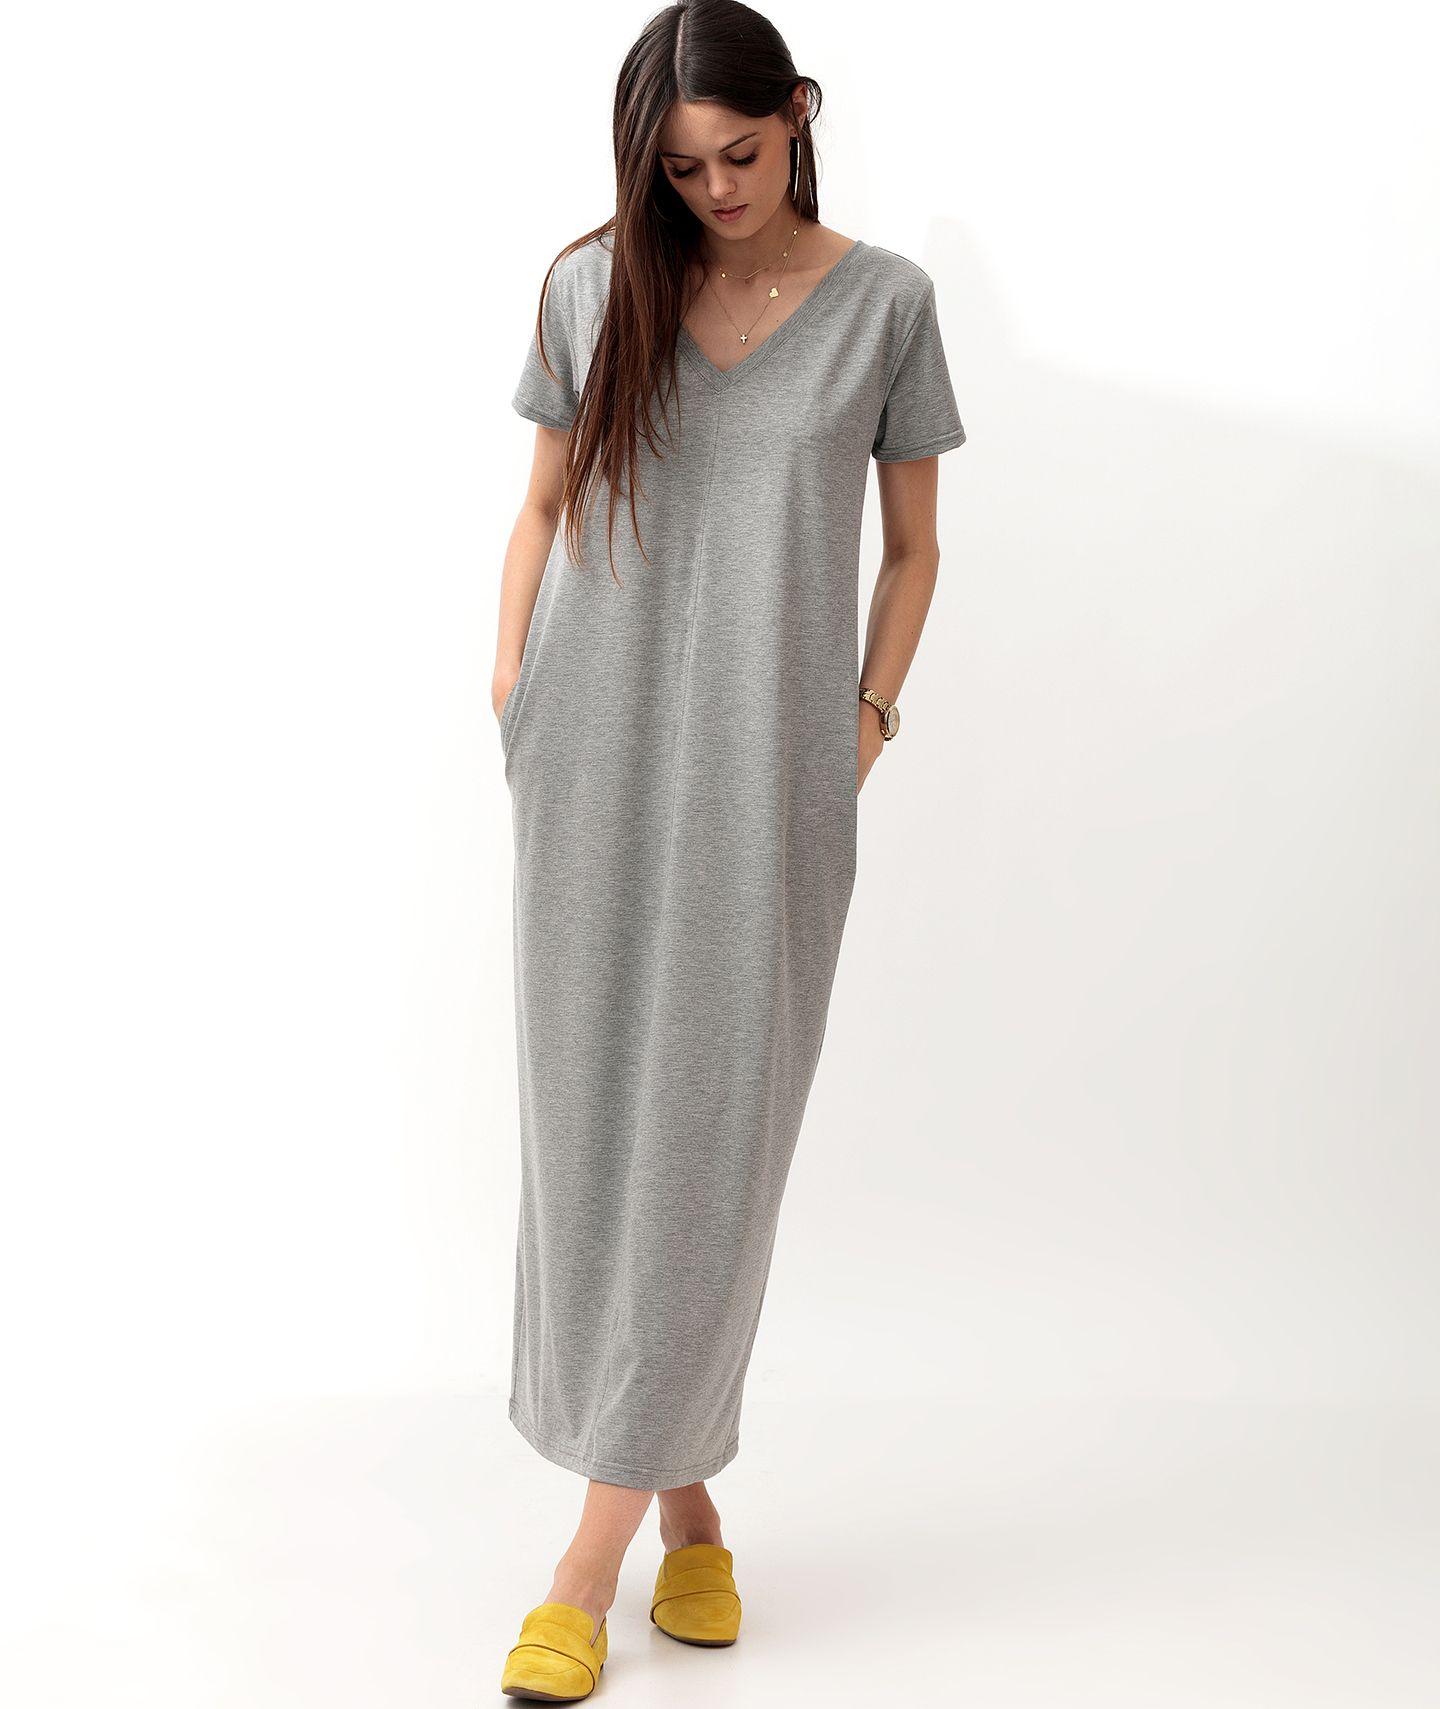 aa6b1da61eee3b sukienka dzianinowa RENA Dress |monologo.pl